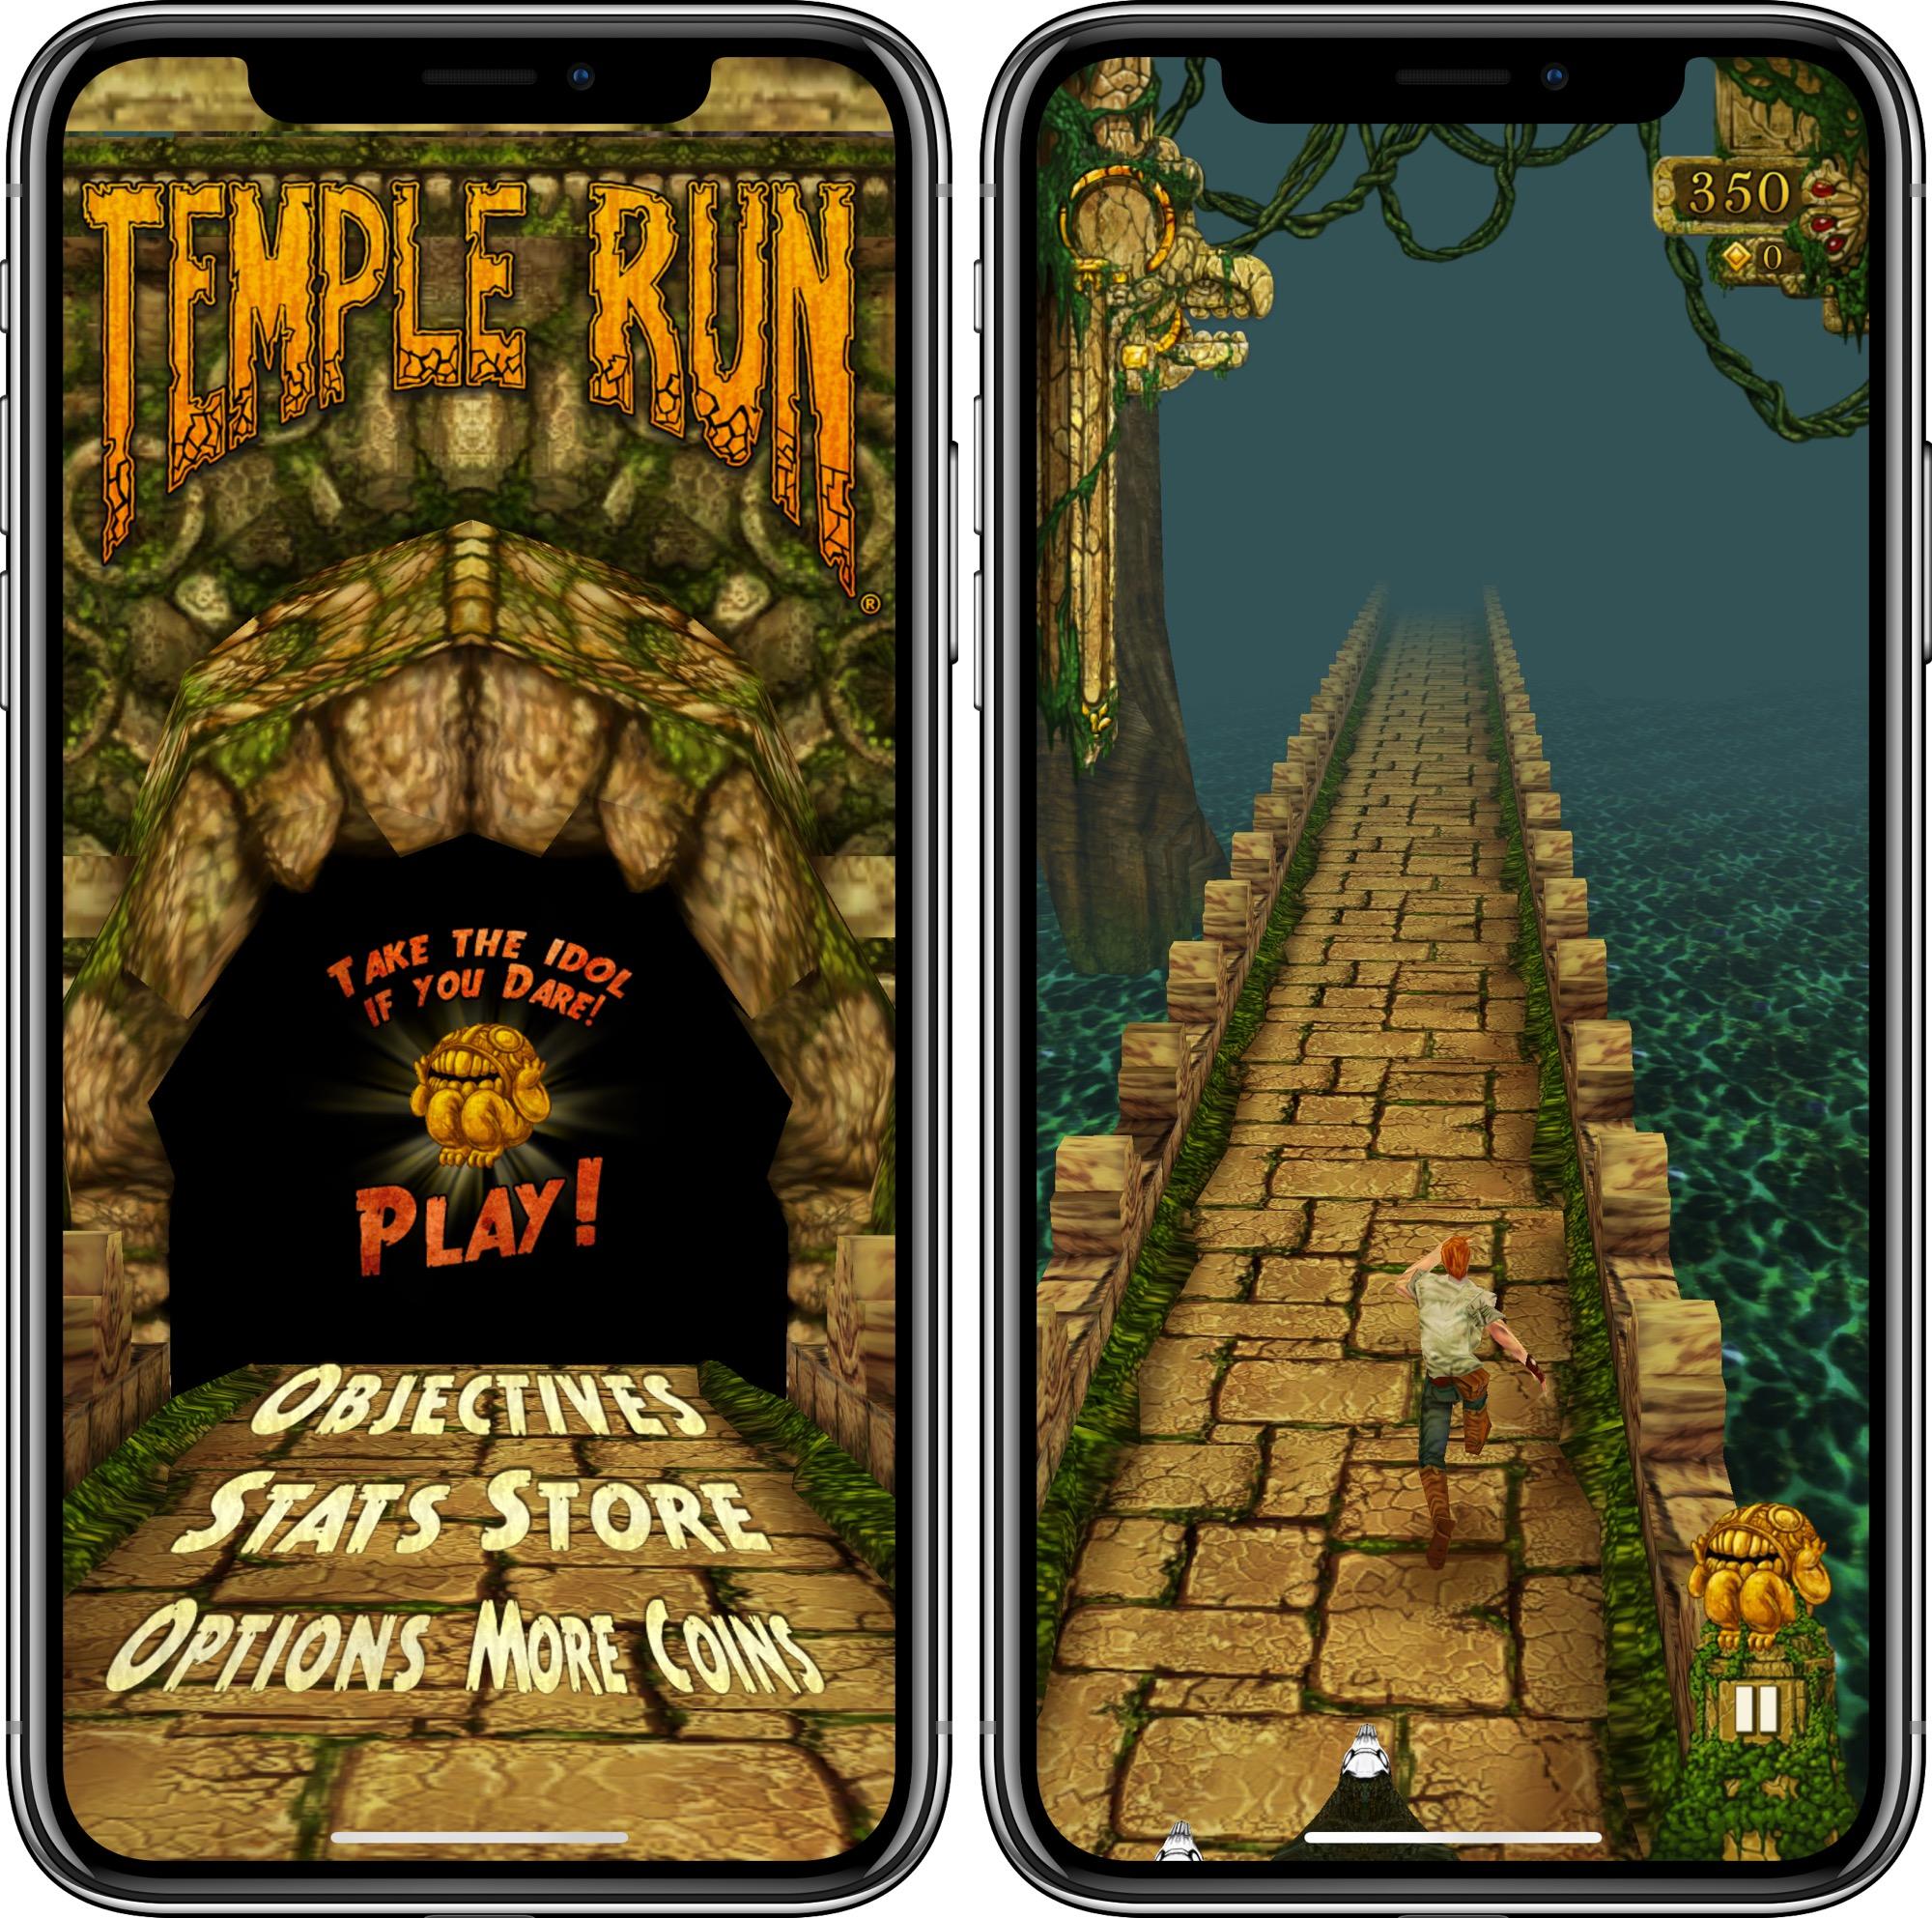 temple run 2008